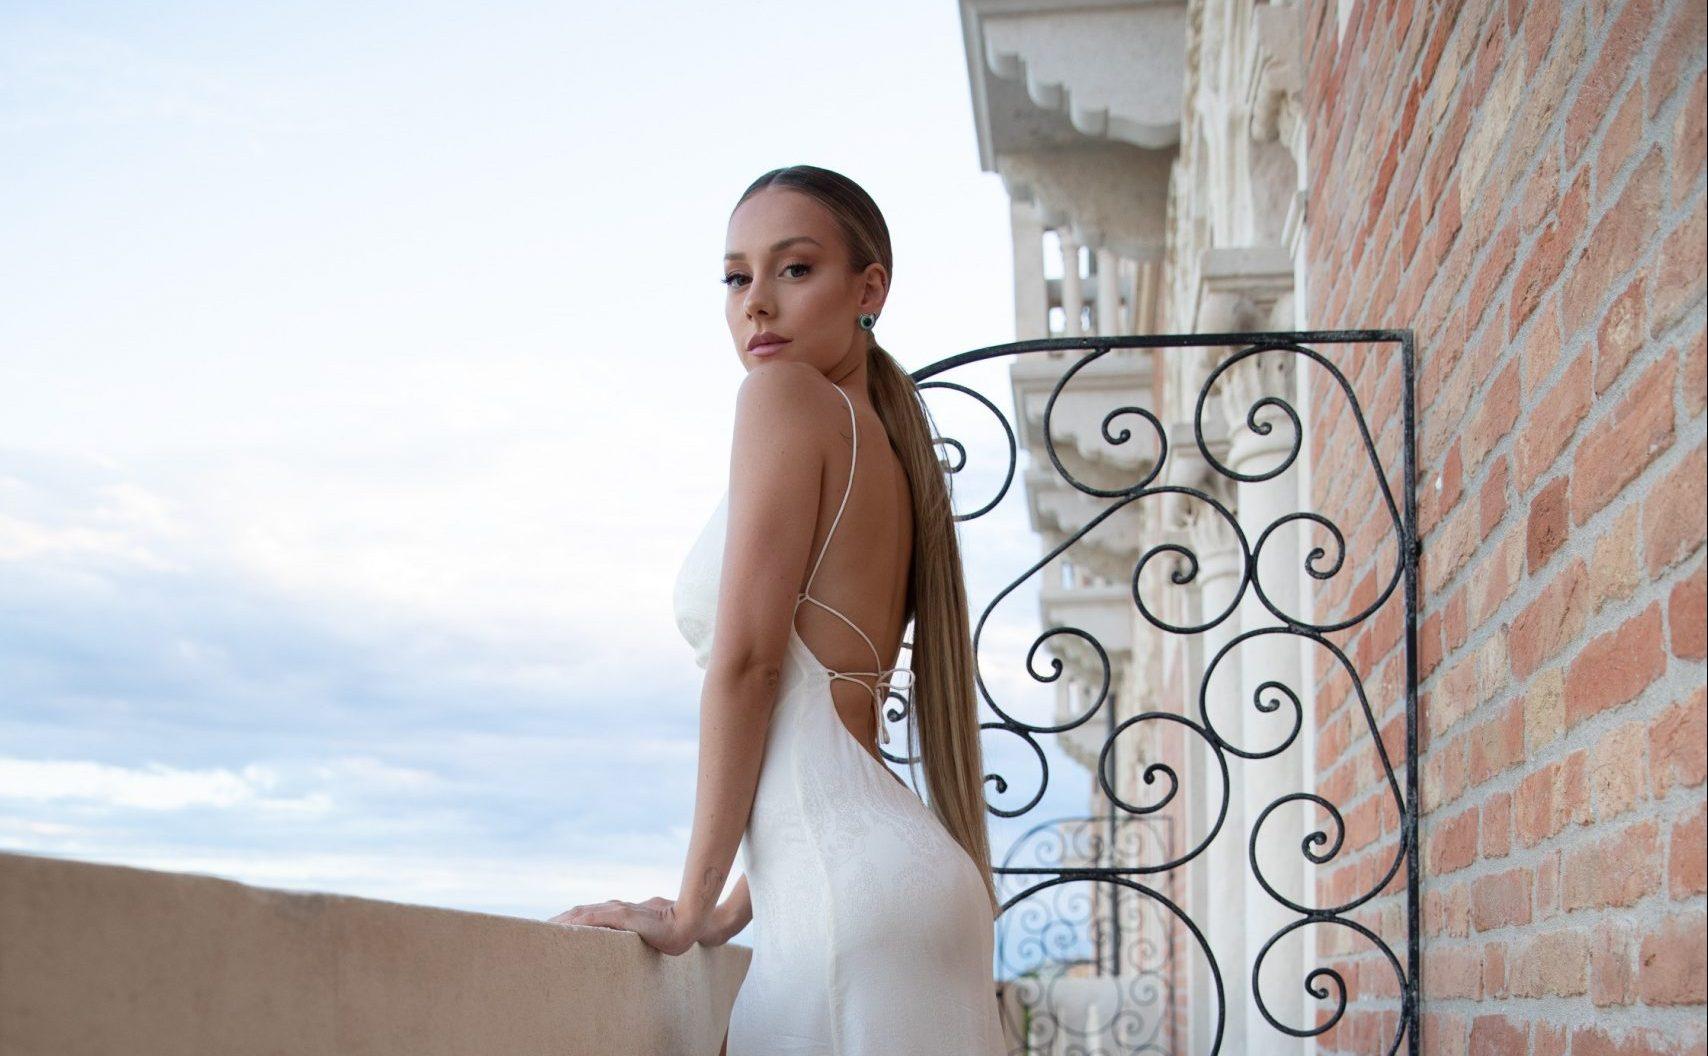 Ester Expósito deslumbró con el icónico look «Pillow Talk» de Charlotte Tilbury